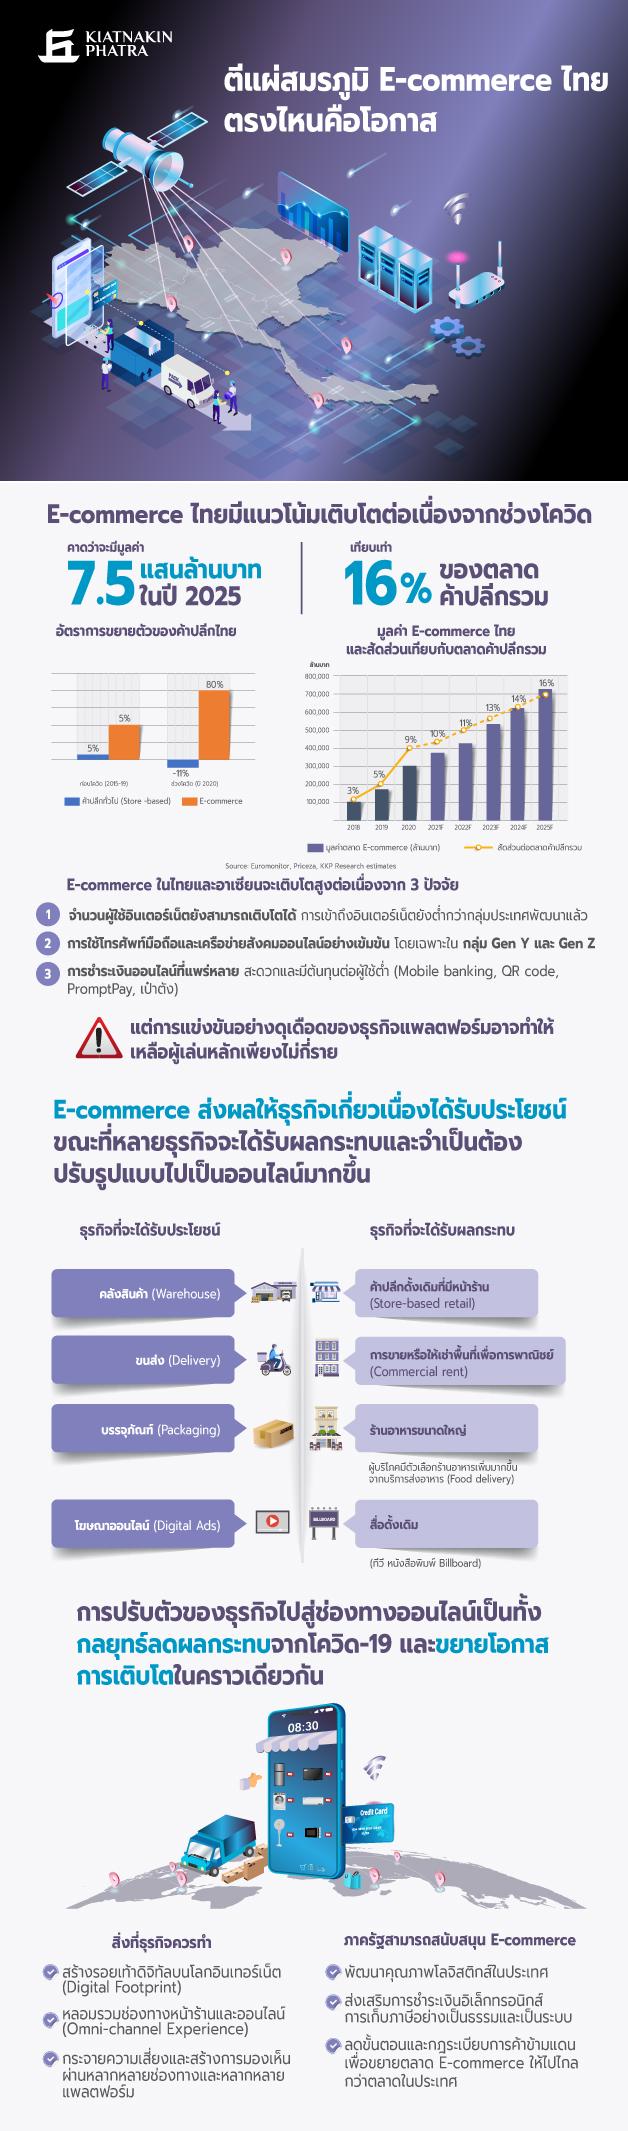 E-commerce info